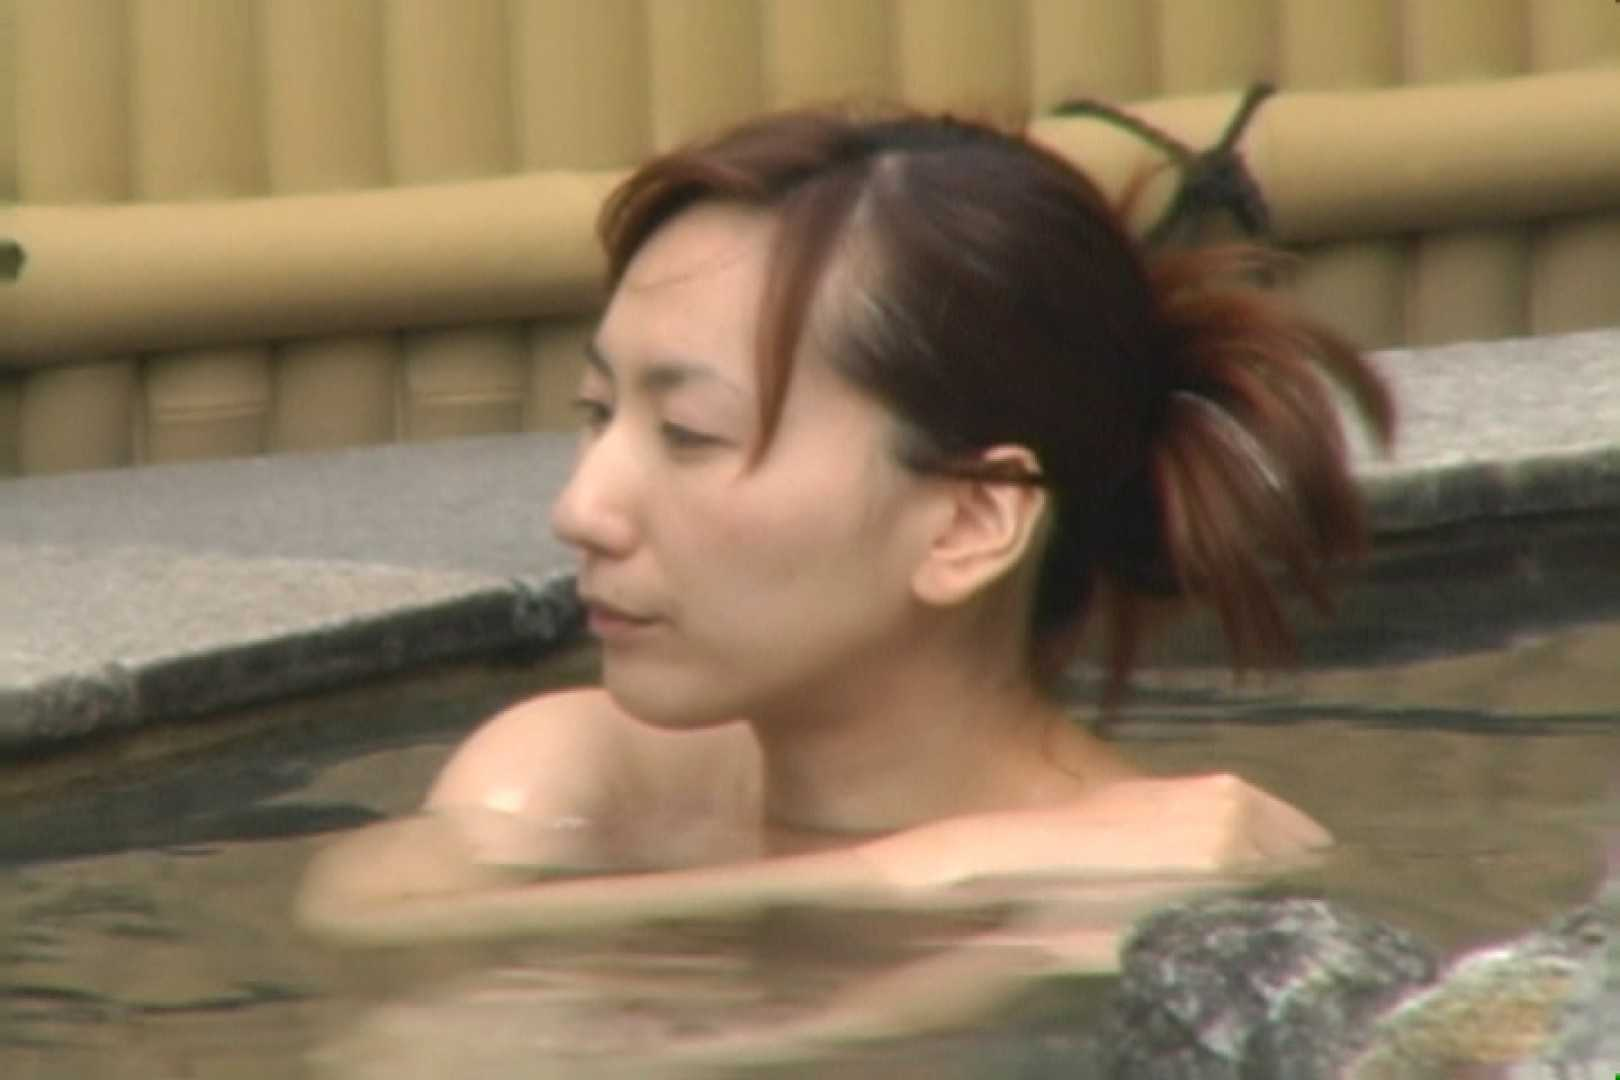 Aquaな露天風呂Vol.616 露天風呂編   盗撮シリーズ  89PIX 31